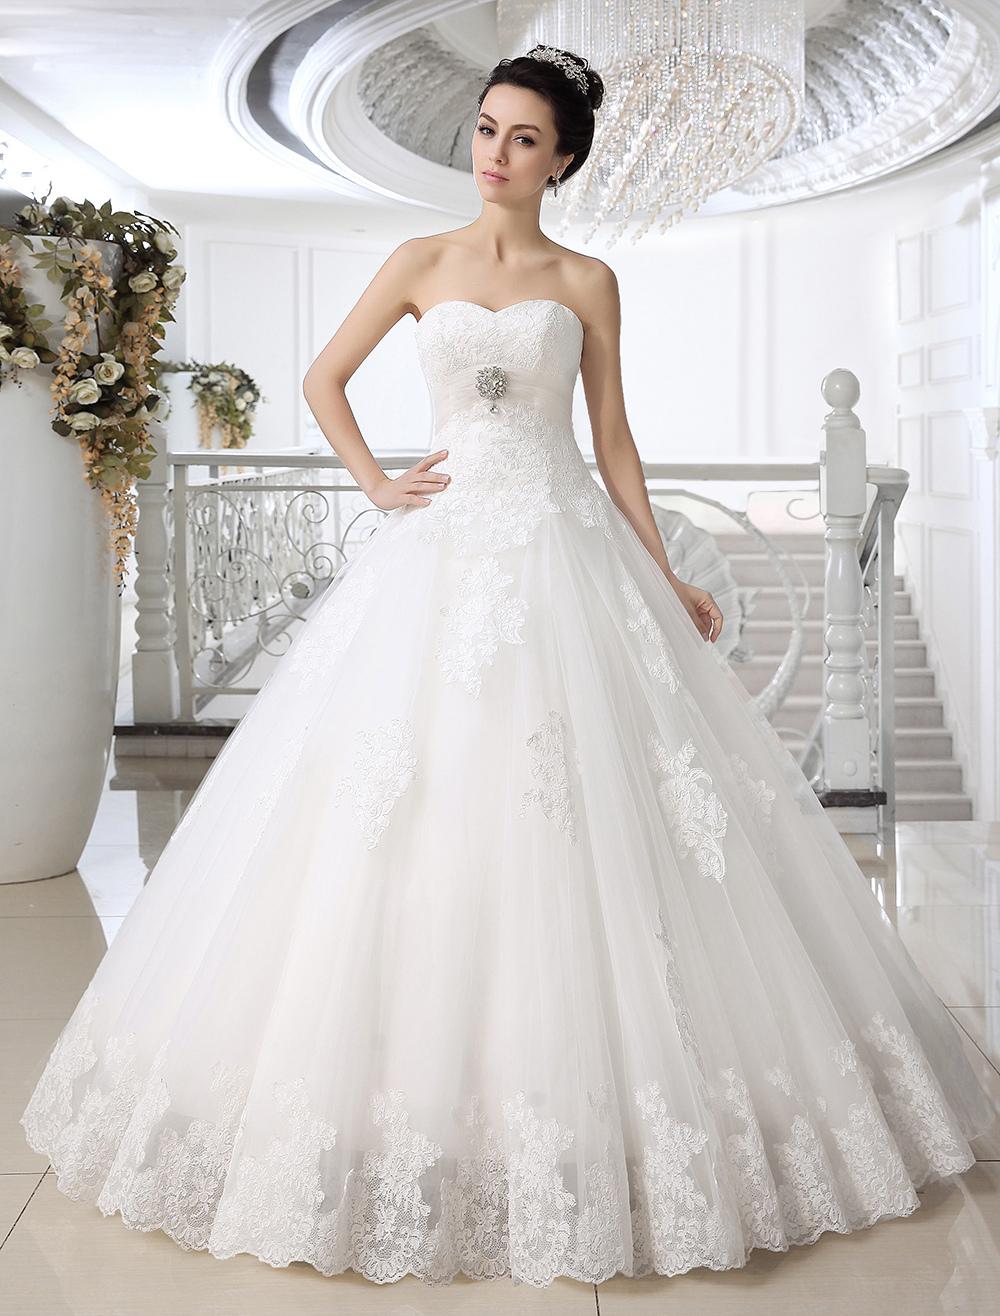 robe de mari e boule en tulle blanc avec perles encolure